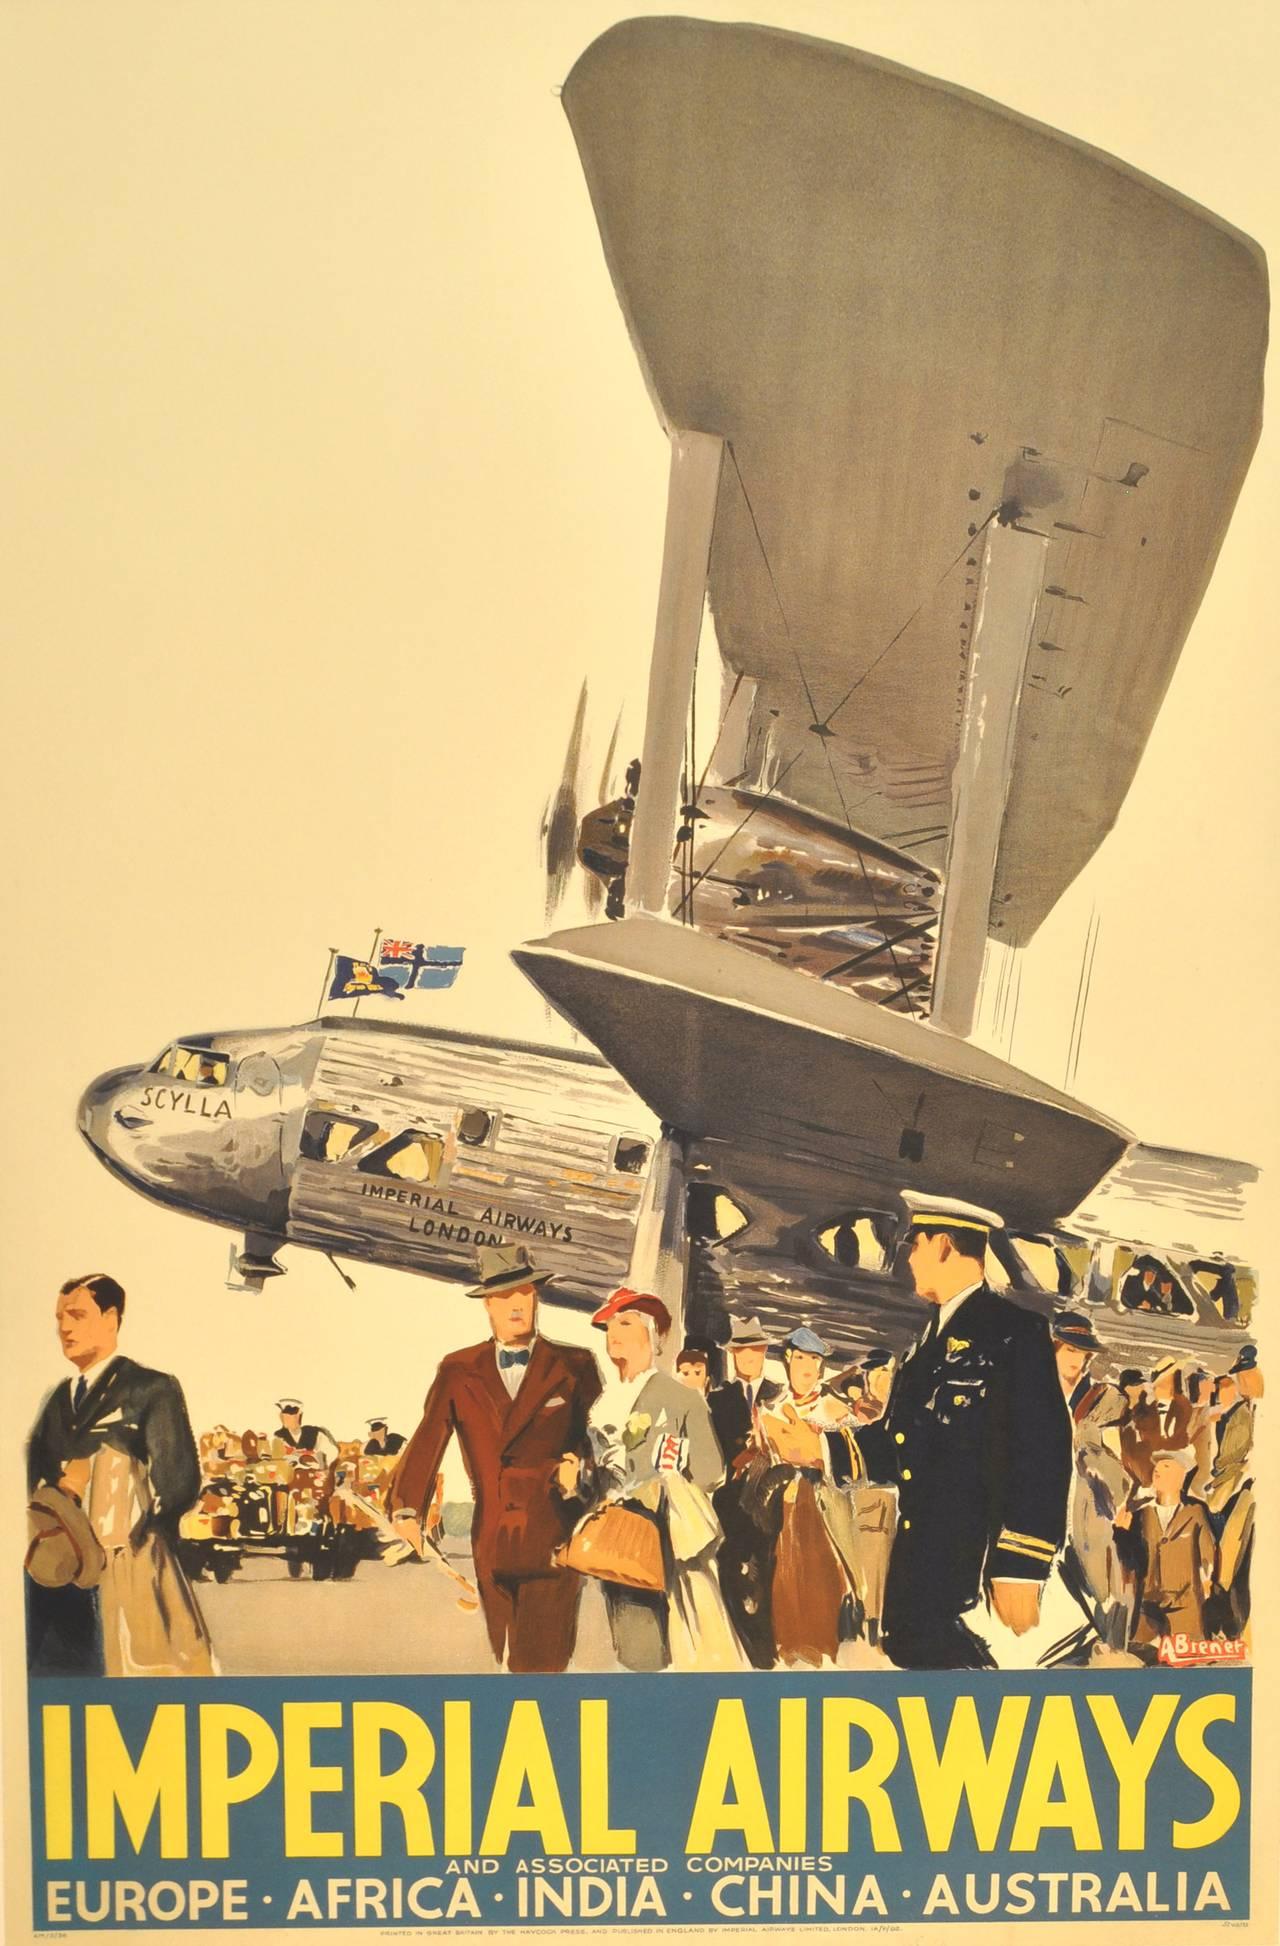 Albert Brenet Original Art Deco Imperial Airways Poster